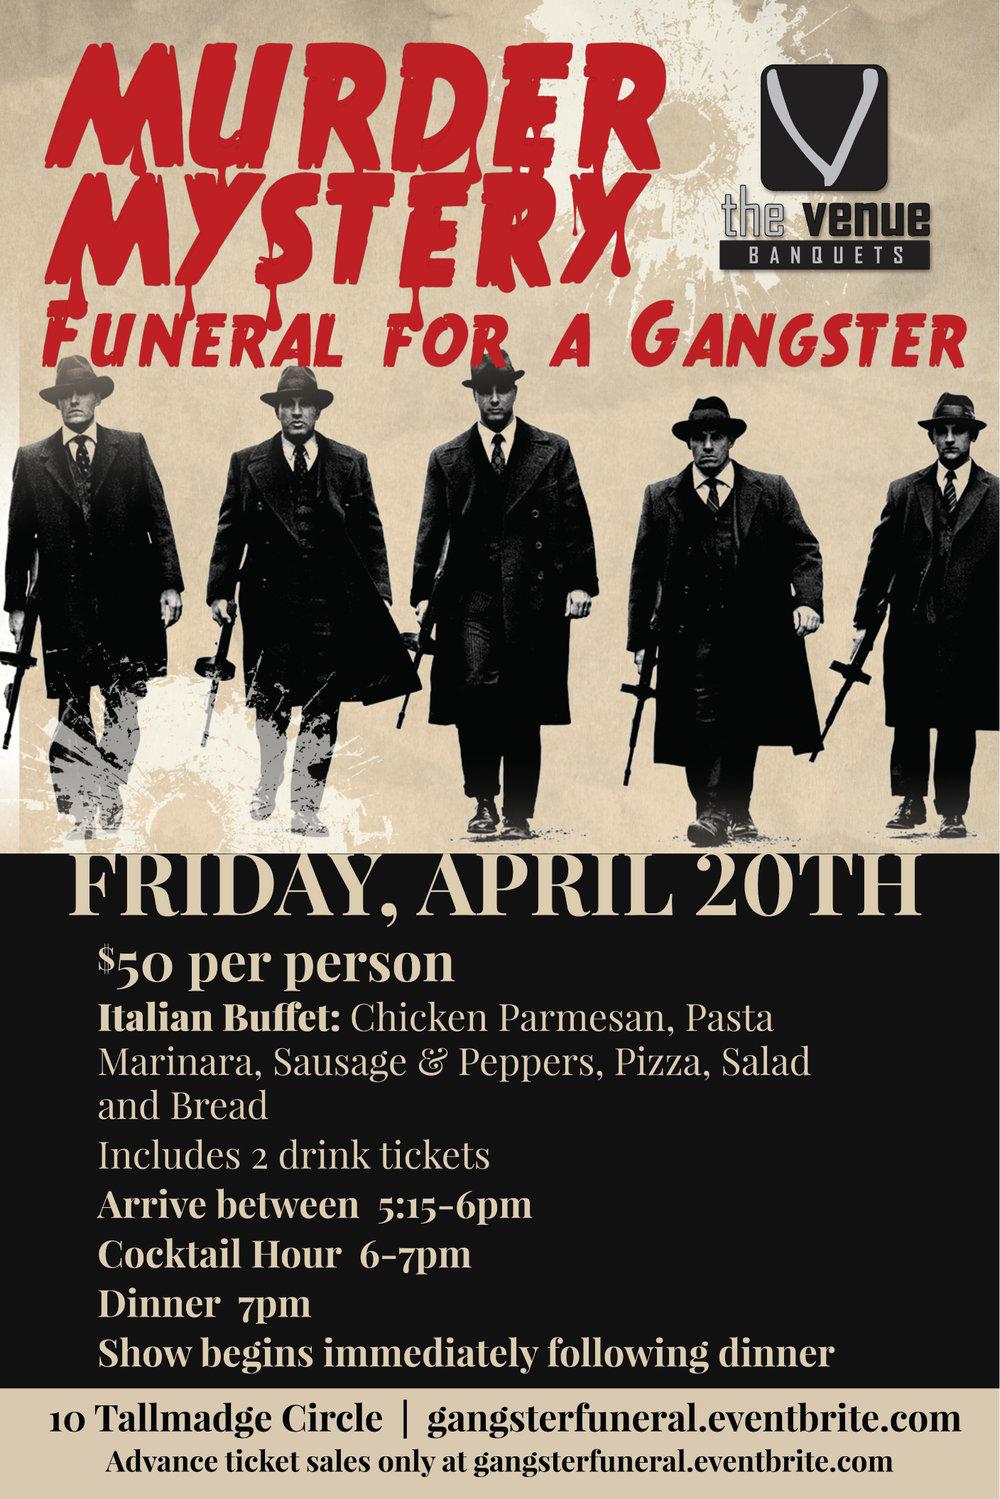 Gangsta_MurderMystery.RGBjpg.jpg